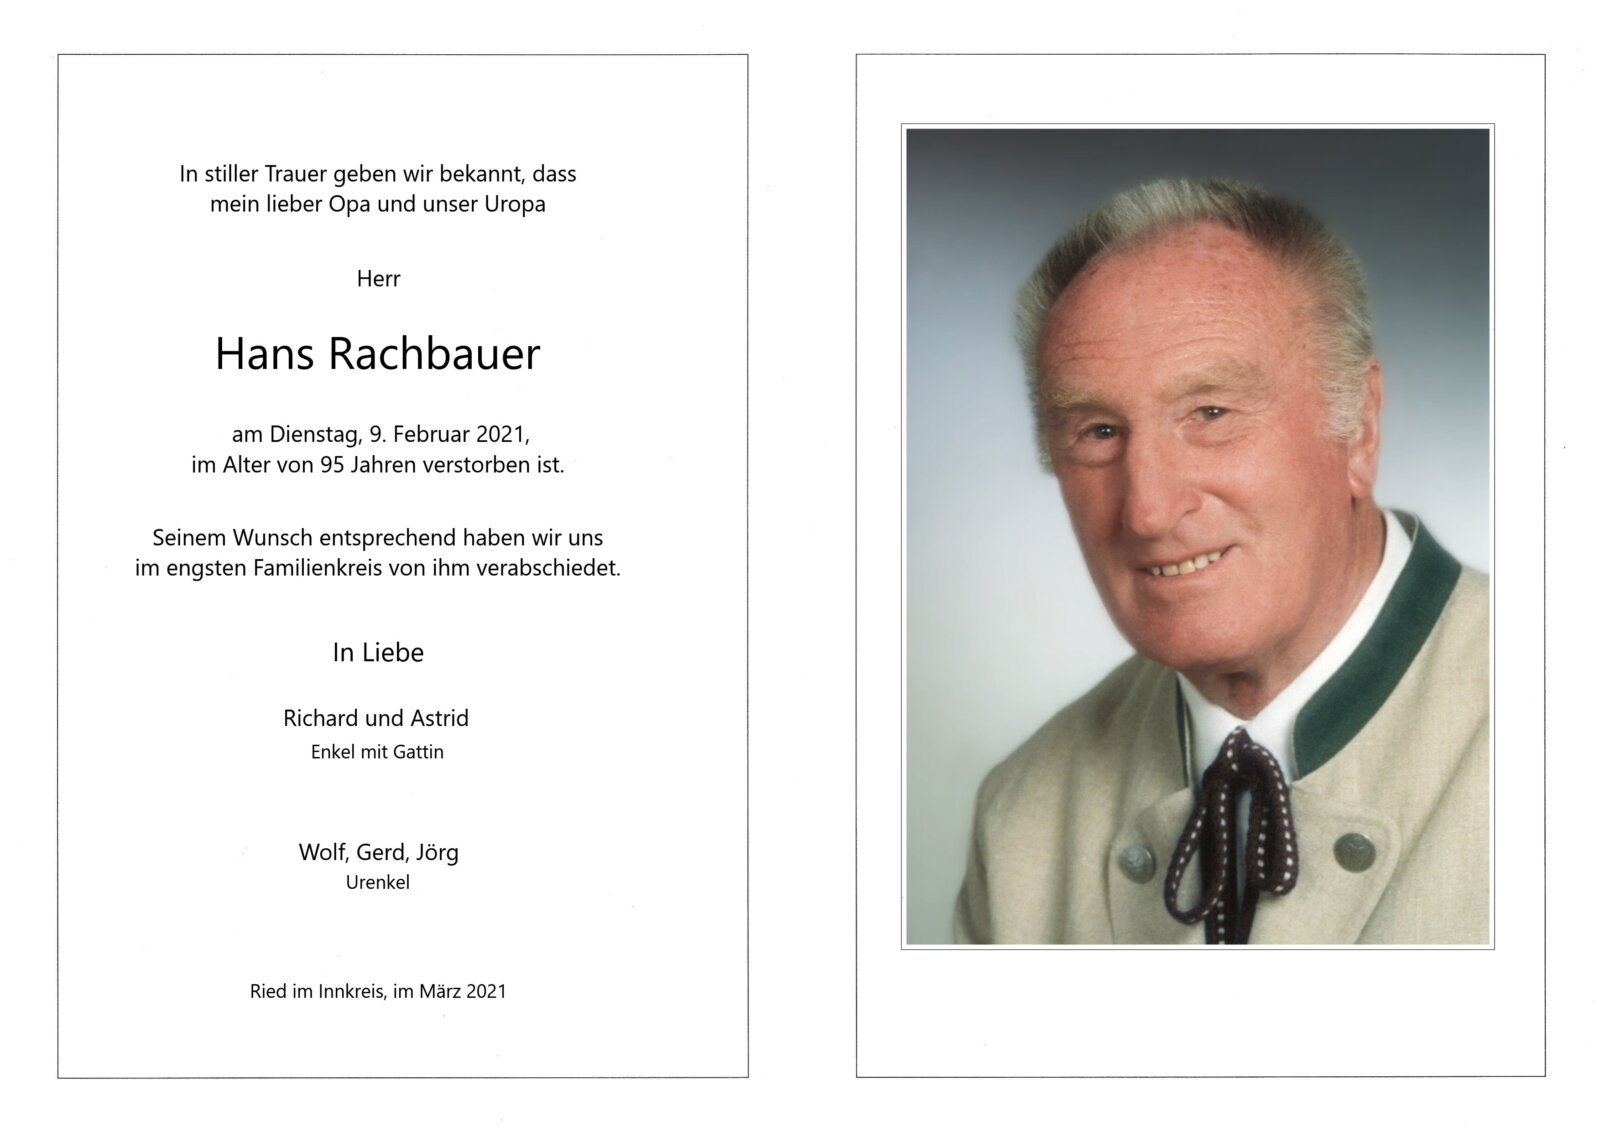 rachbauer-johann-parte